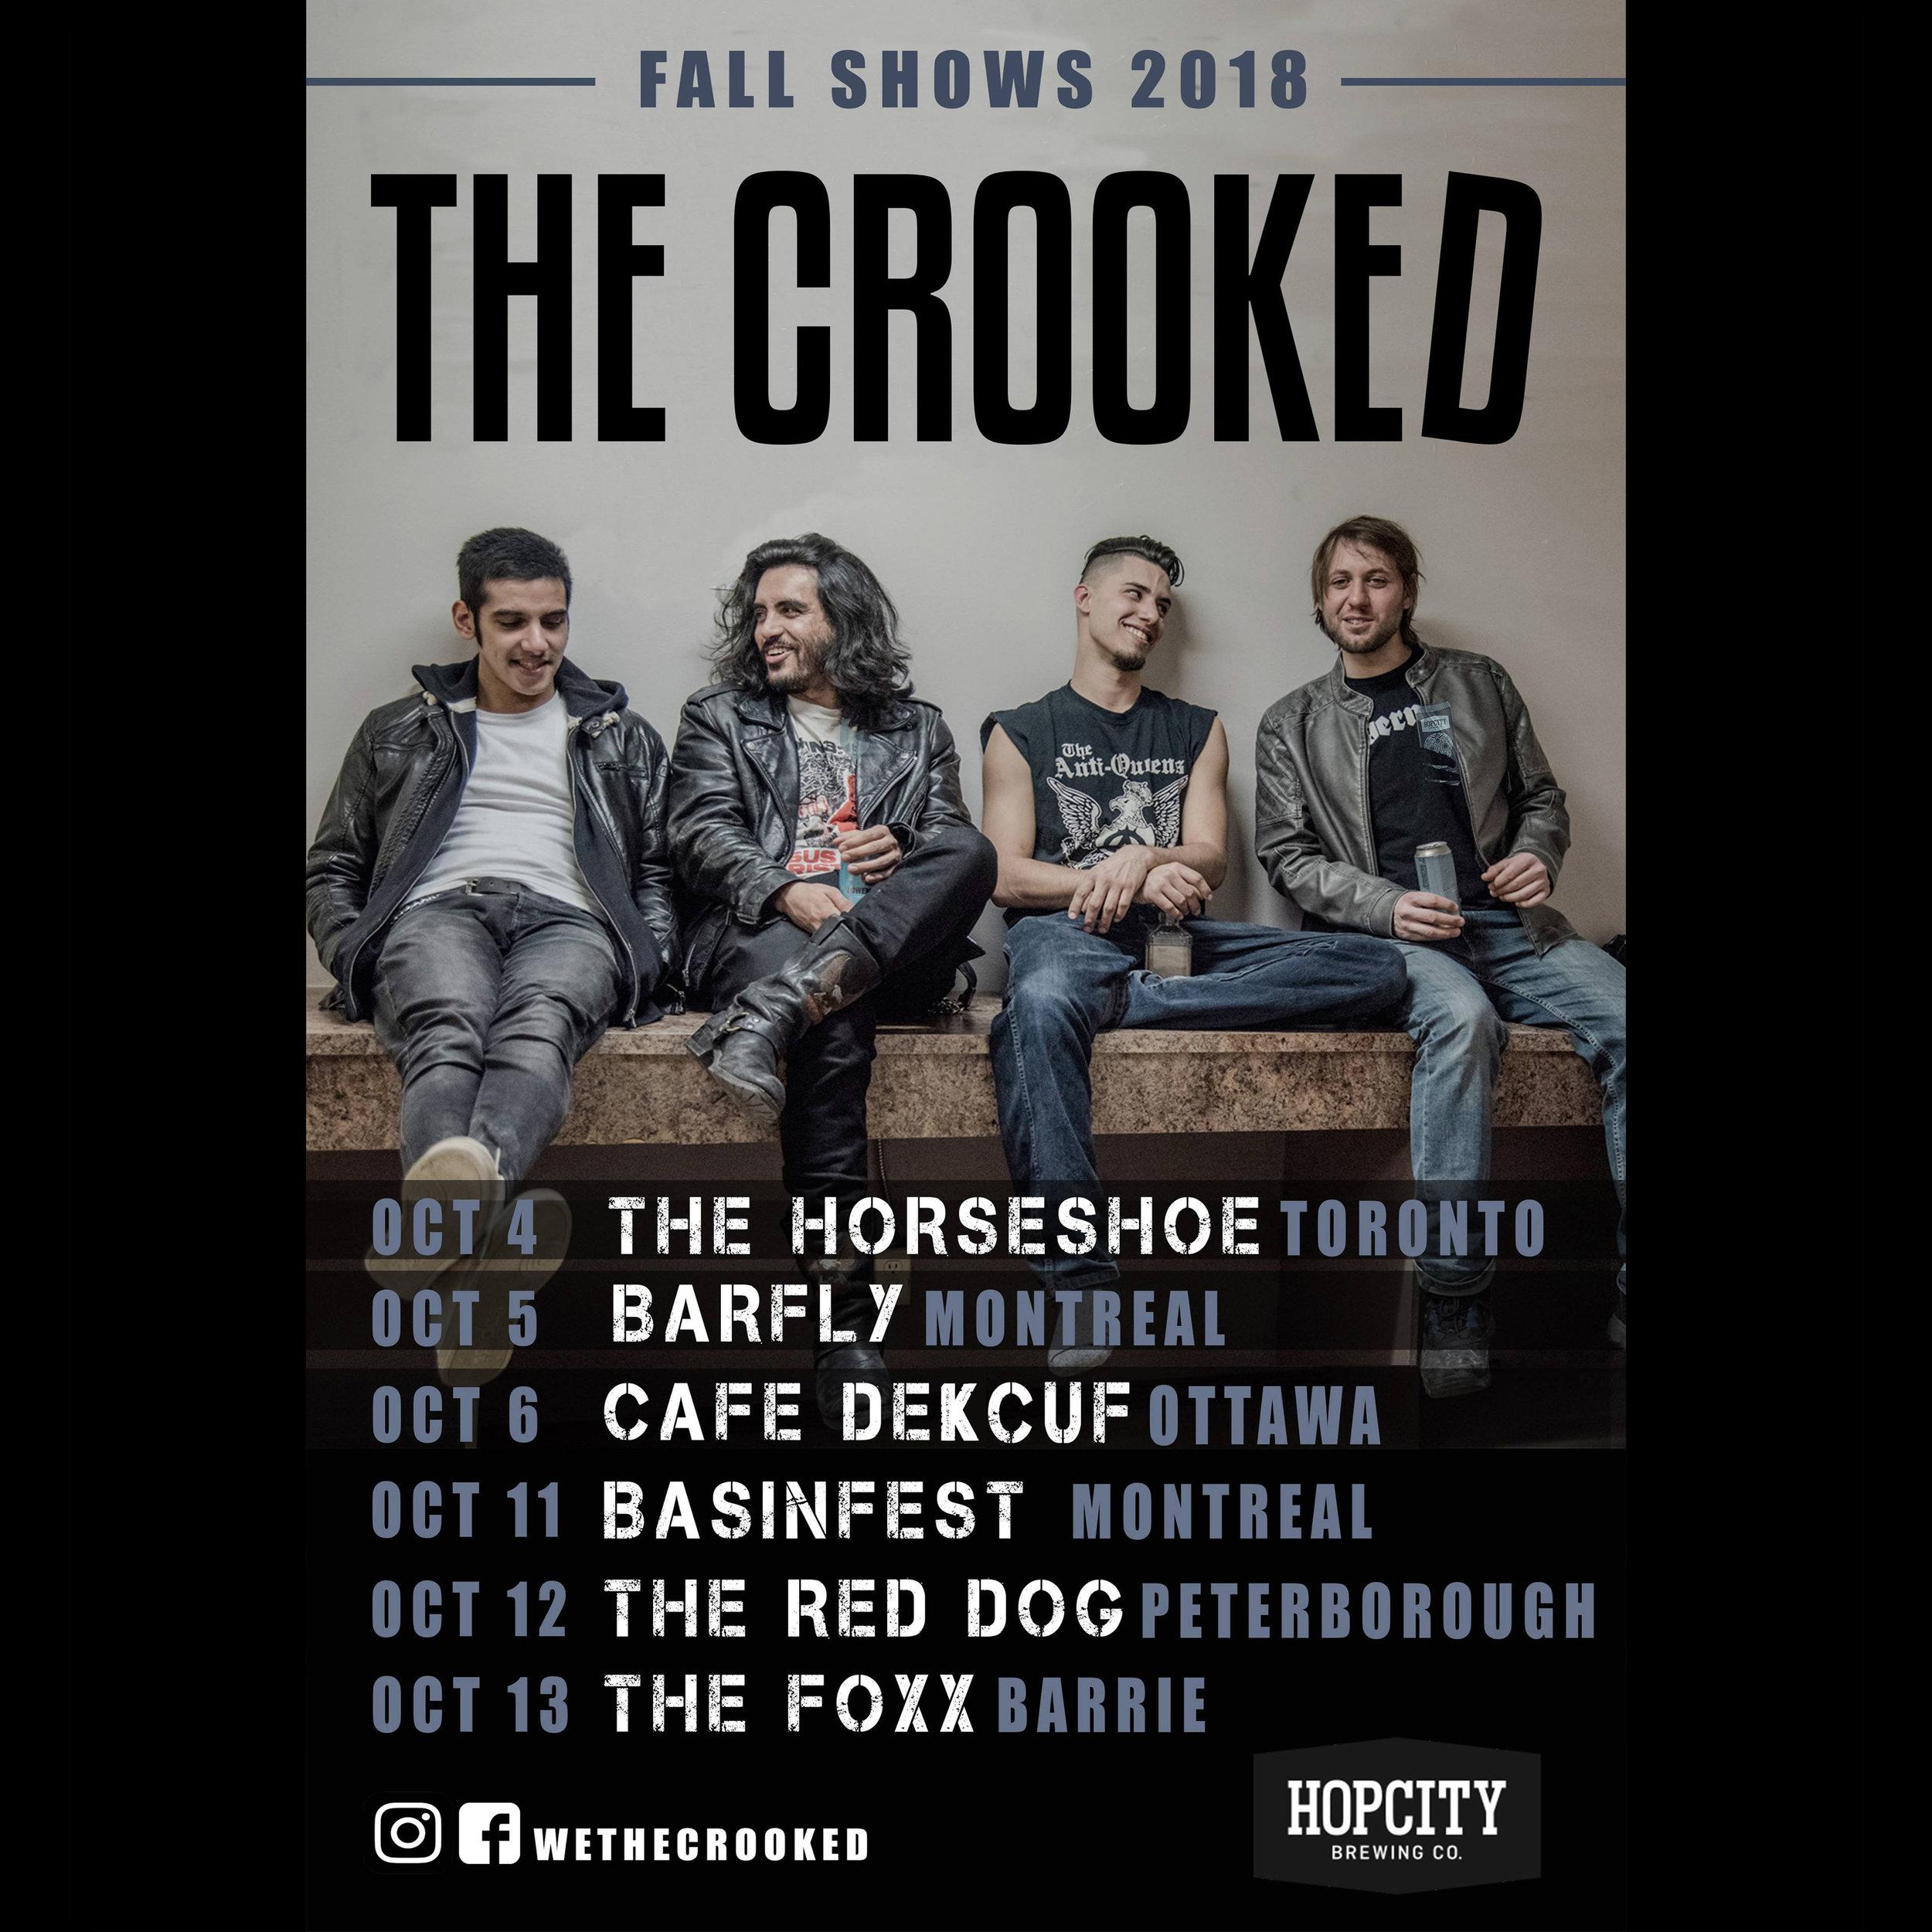 TheCrookedFallshows2018fb.jpg